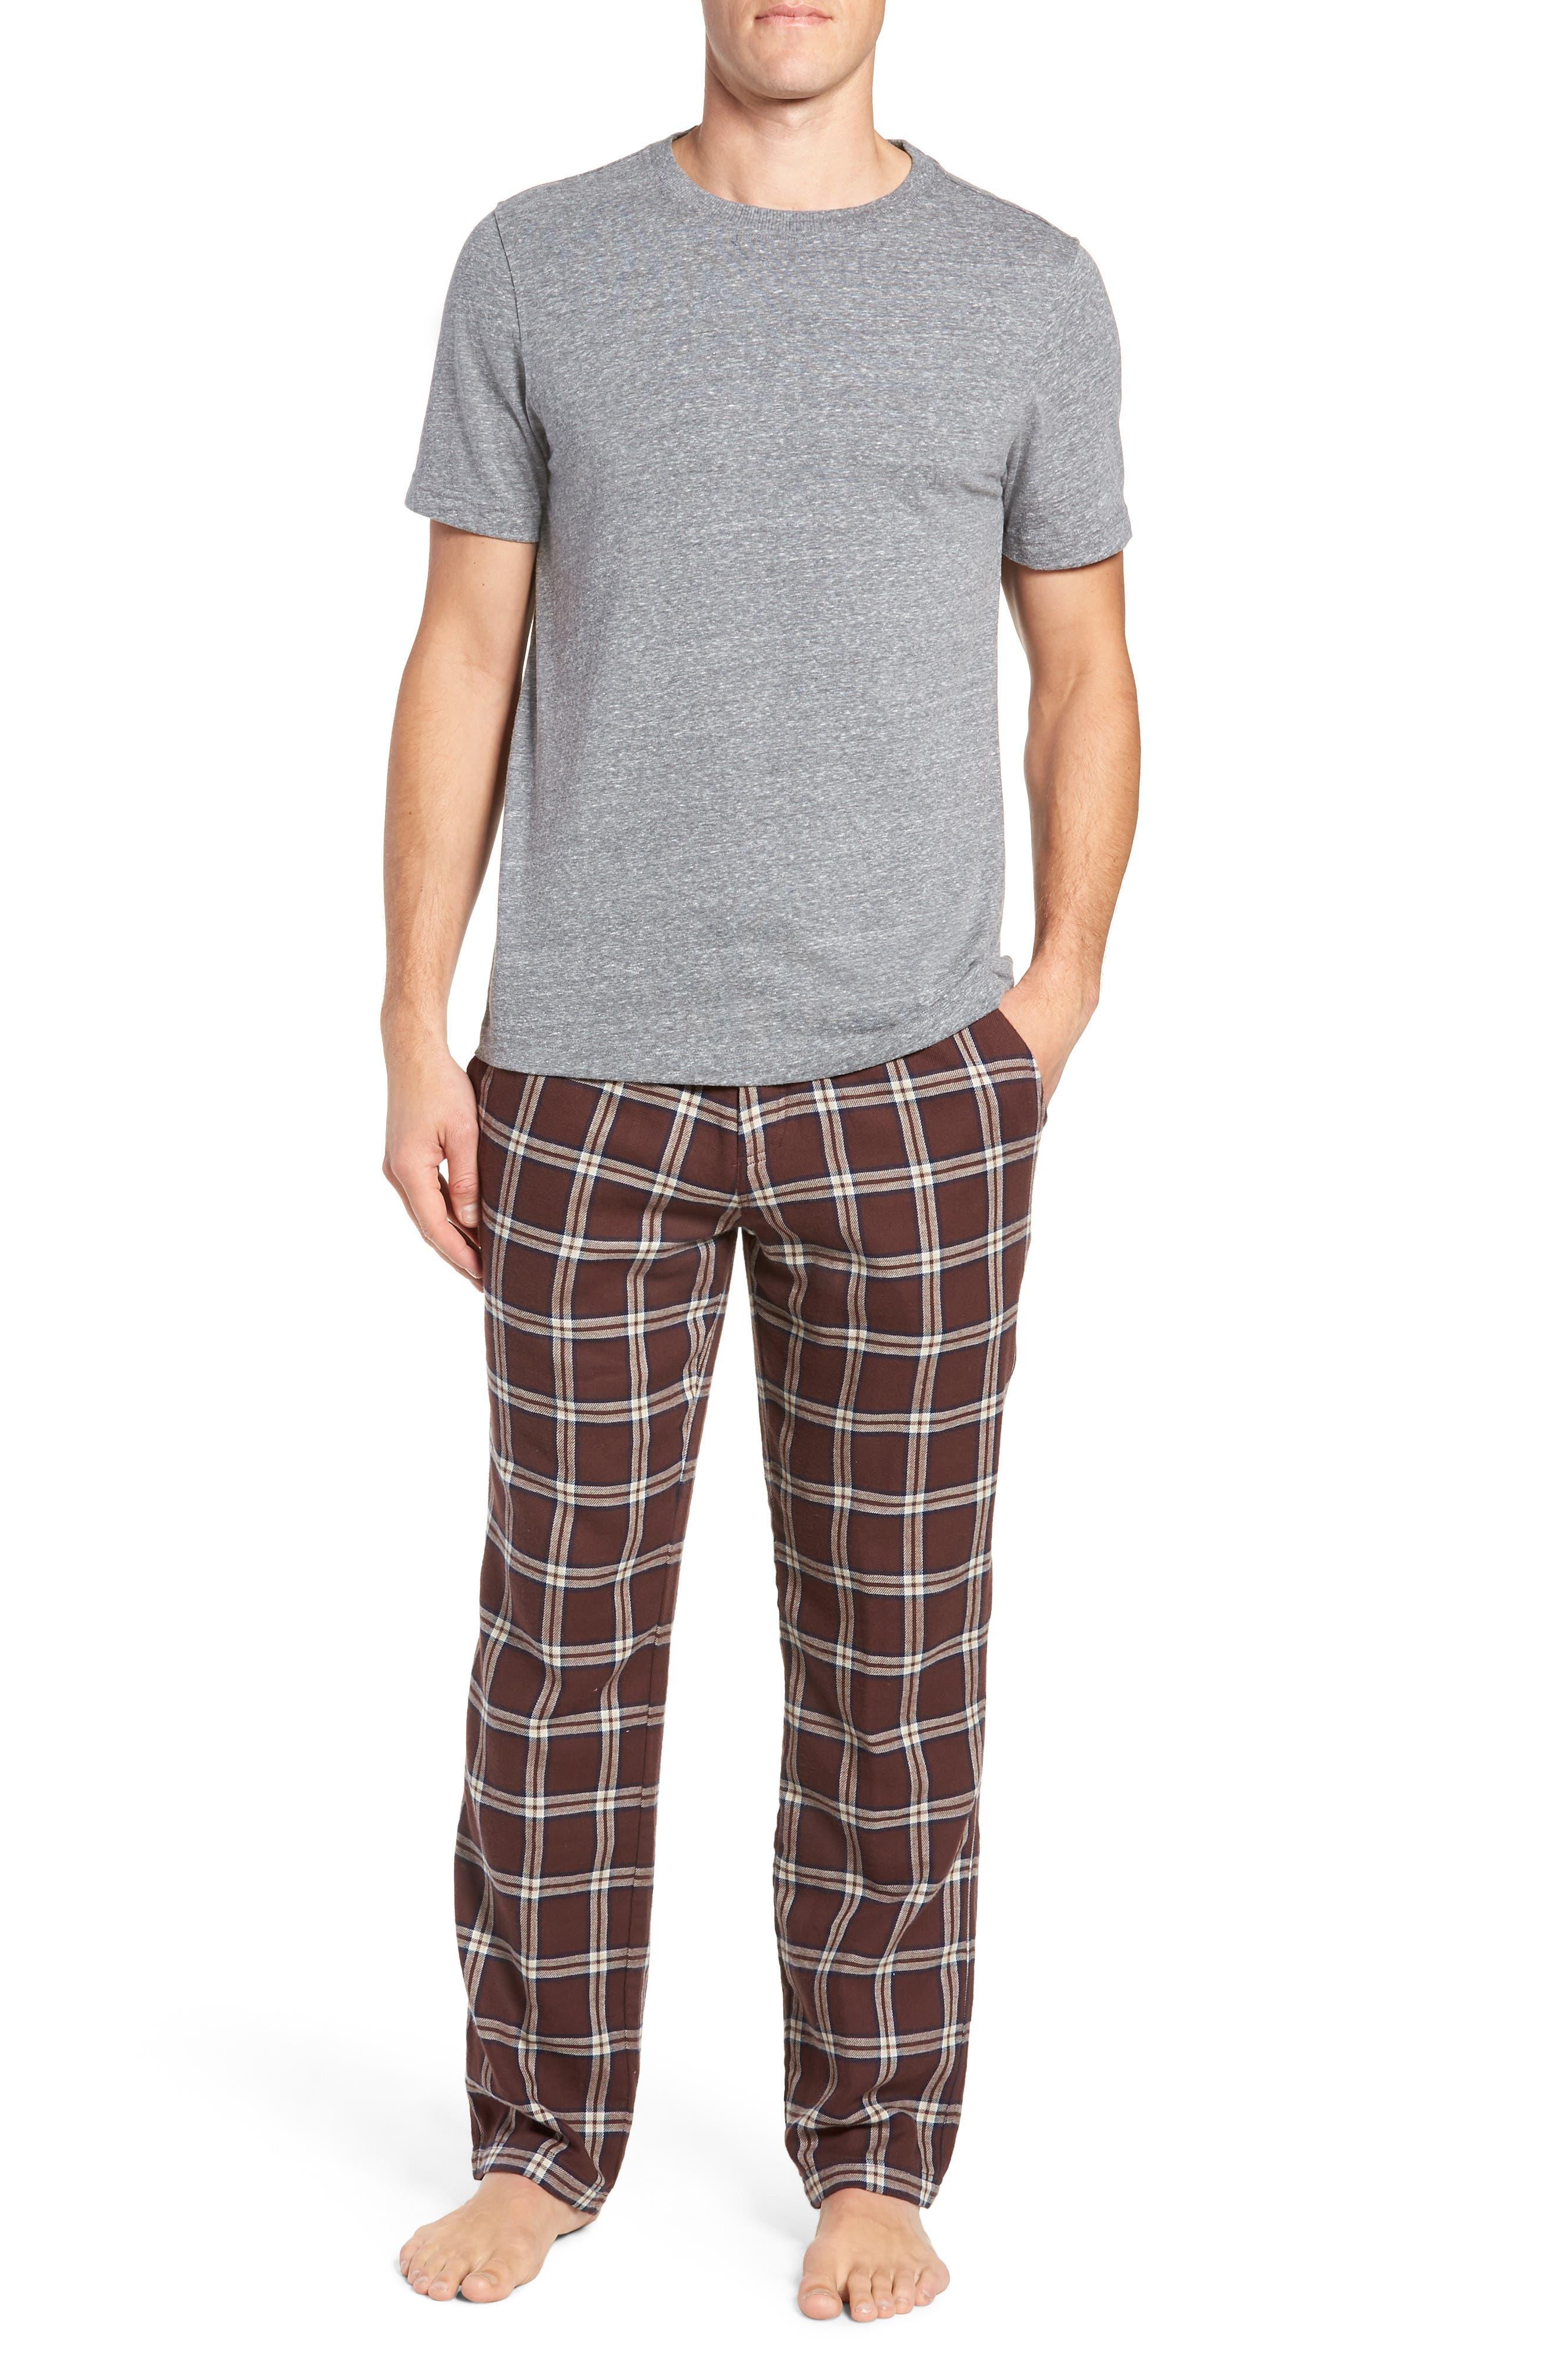 Grant Pajama Set,                         Main,                         color, PORT/ GREY HEATHER